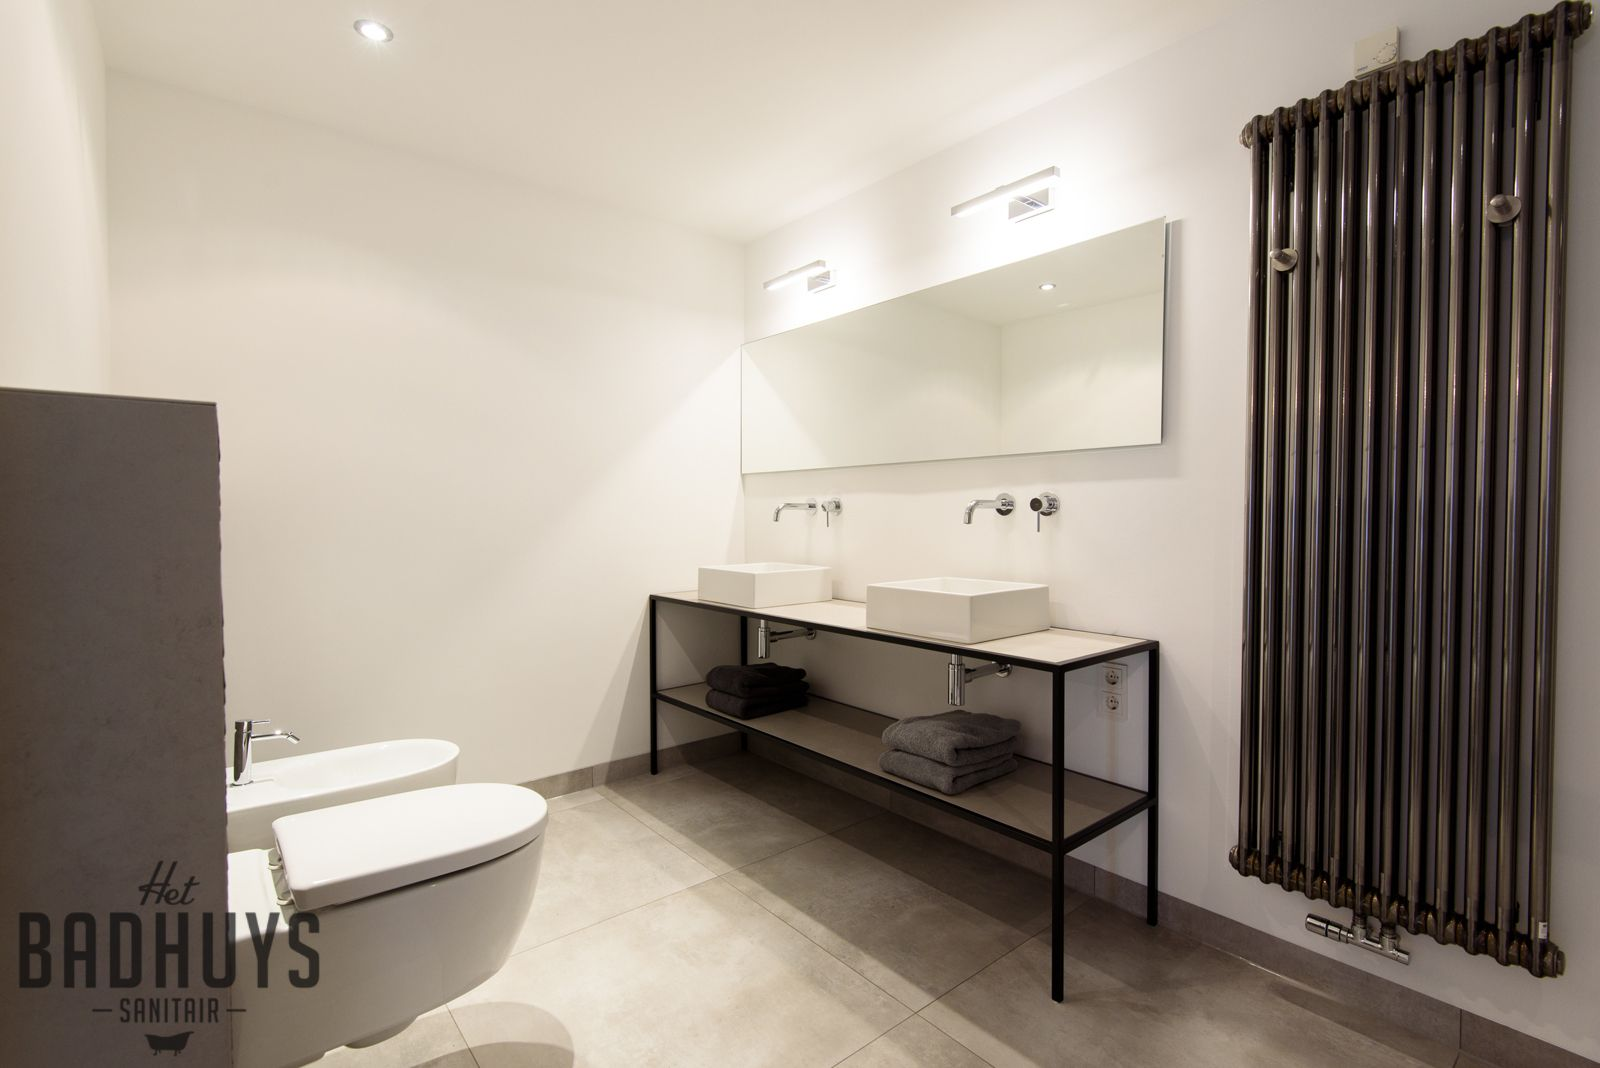 Eigentijdse badkamer met ruime inloopdouche het badhuys